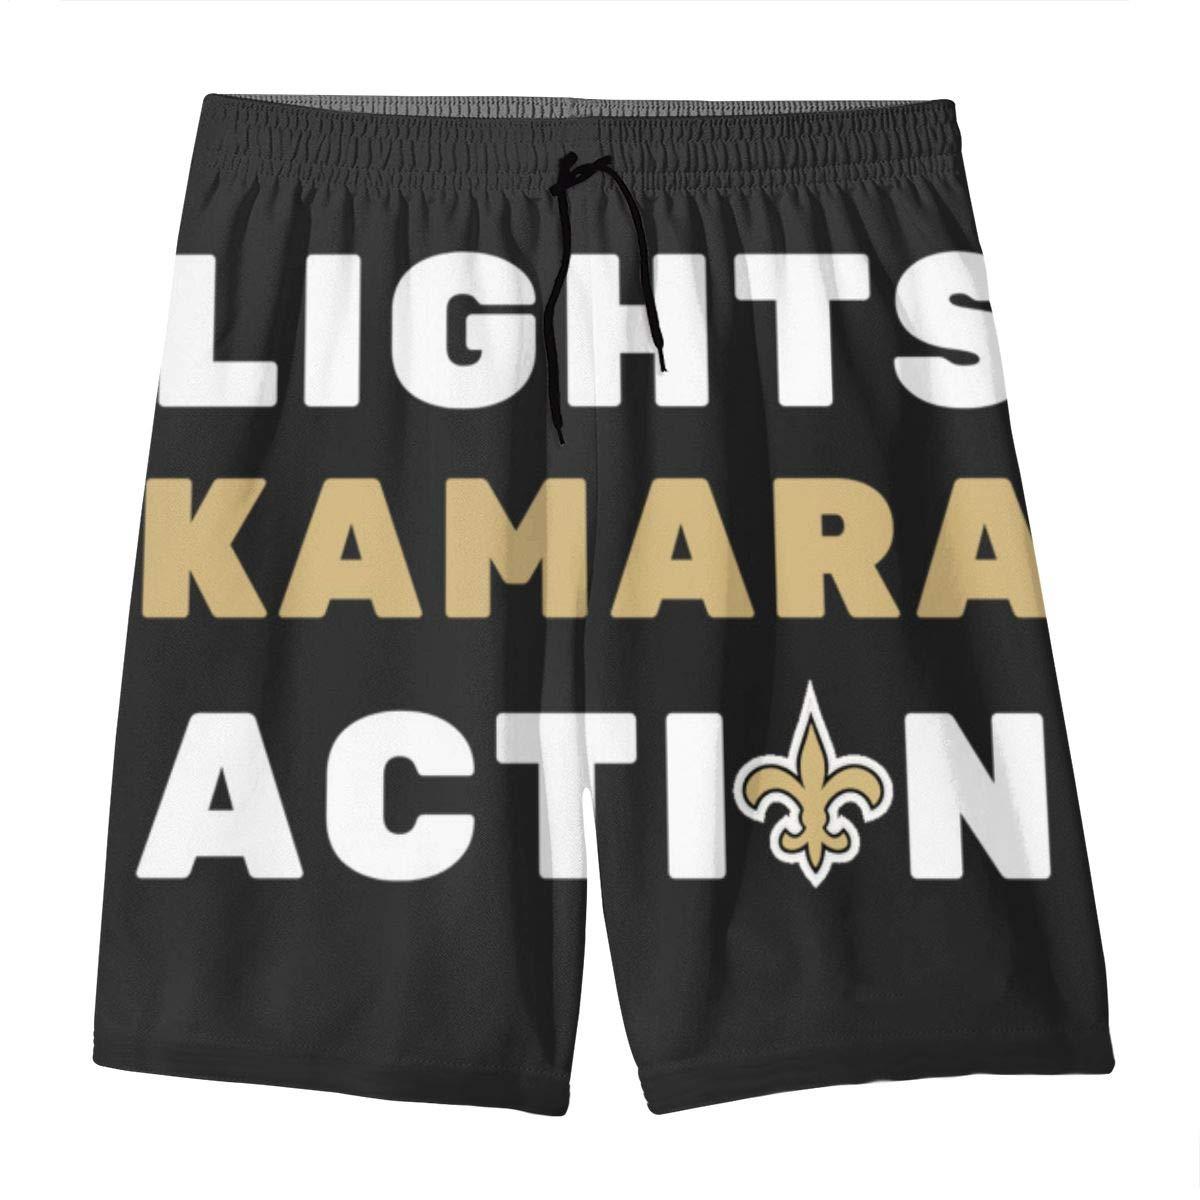 Lights Kamara Action Teens Beach Board Shorts Quick Dry Bathing Suits Swim Trunks Shorts